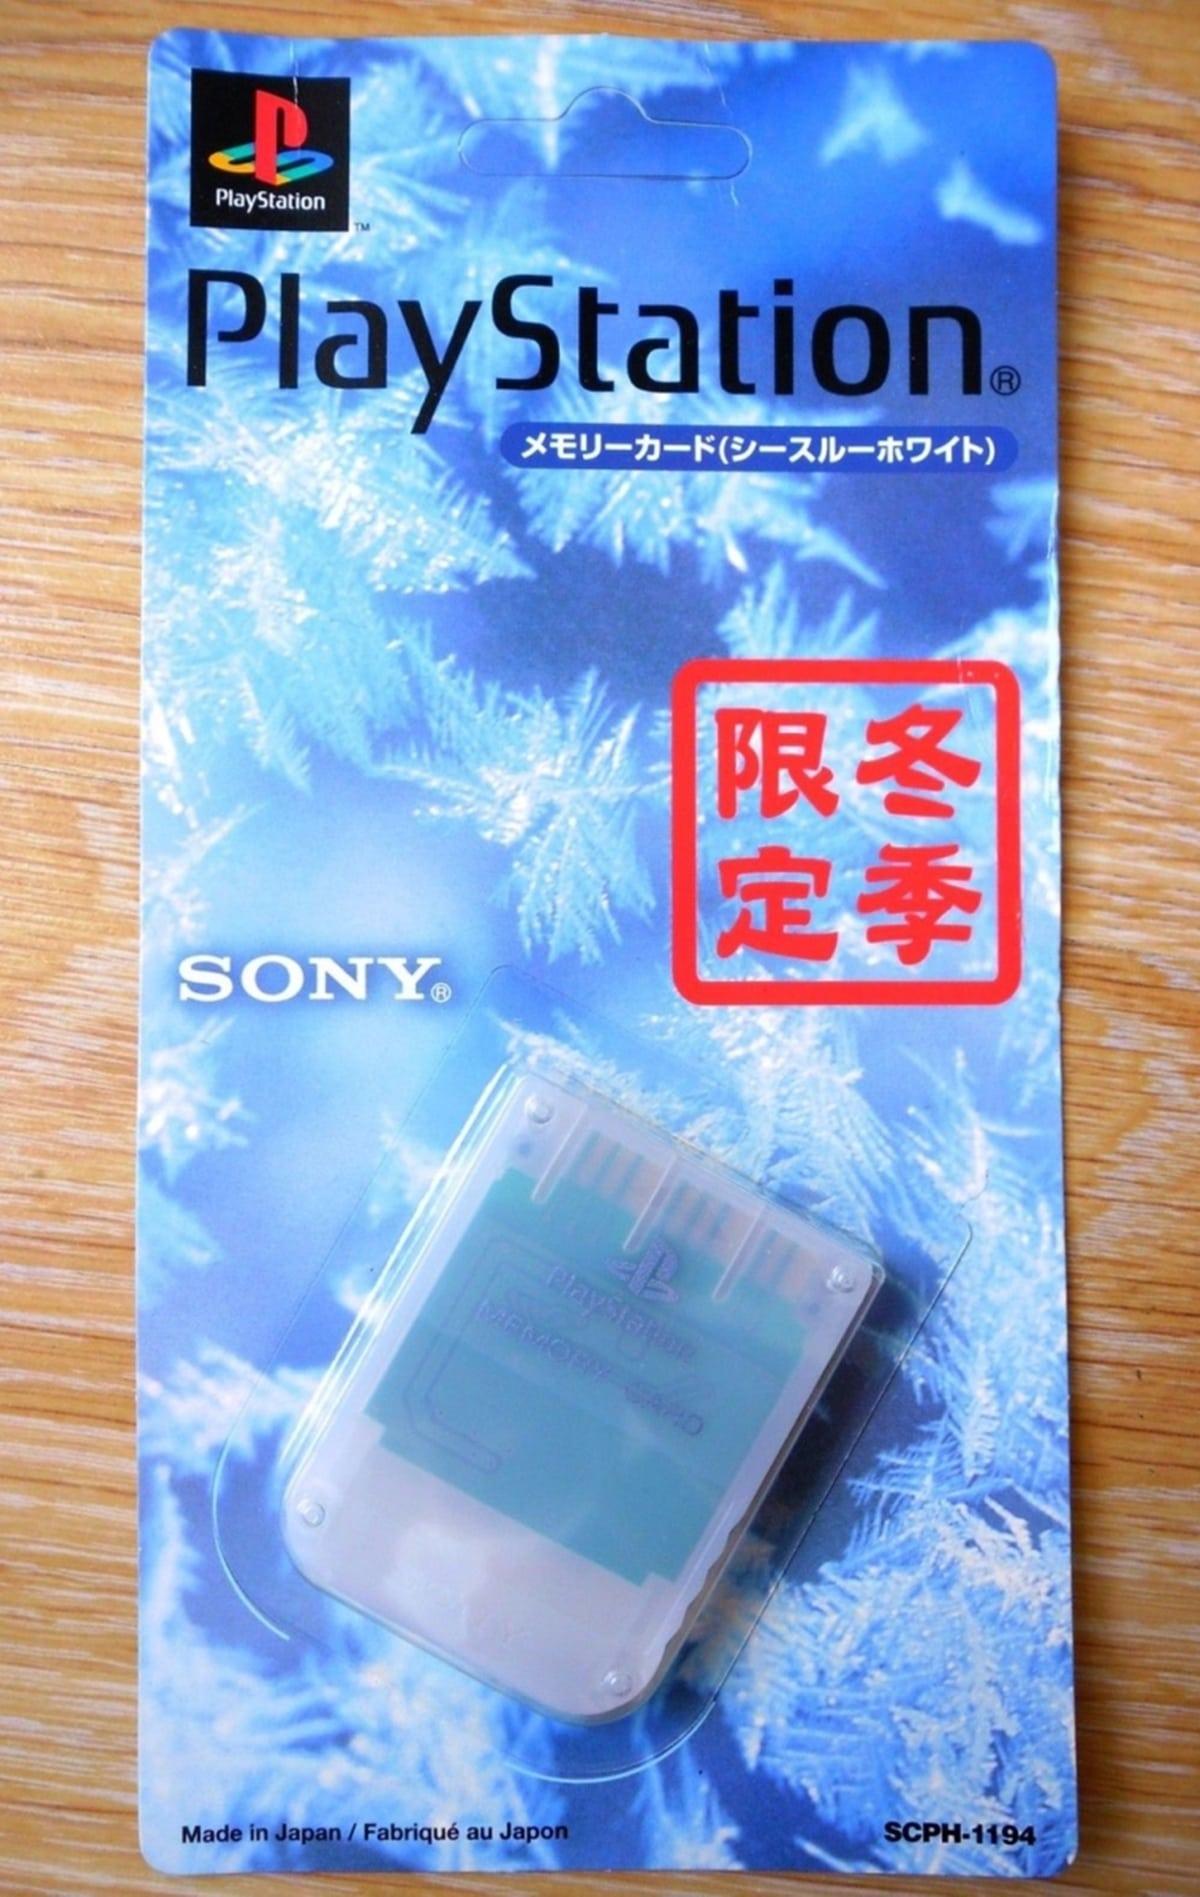 memory card scph 1194 011 - [SCPH-1020] Memory Card / Karta pamięci